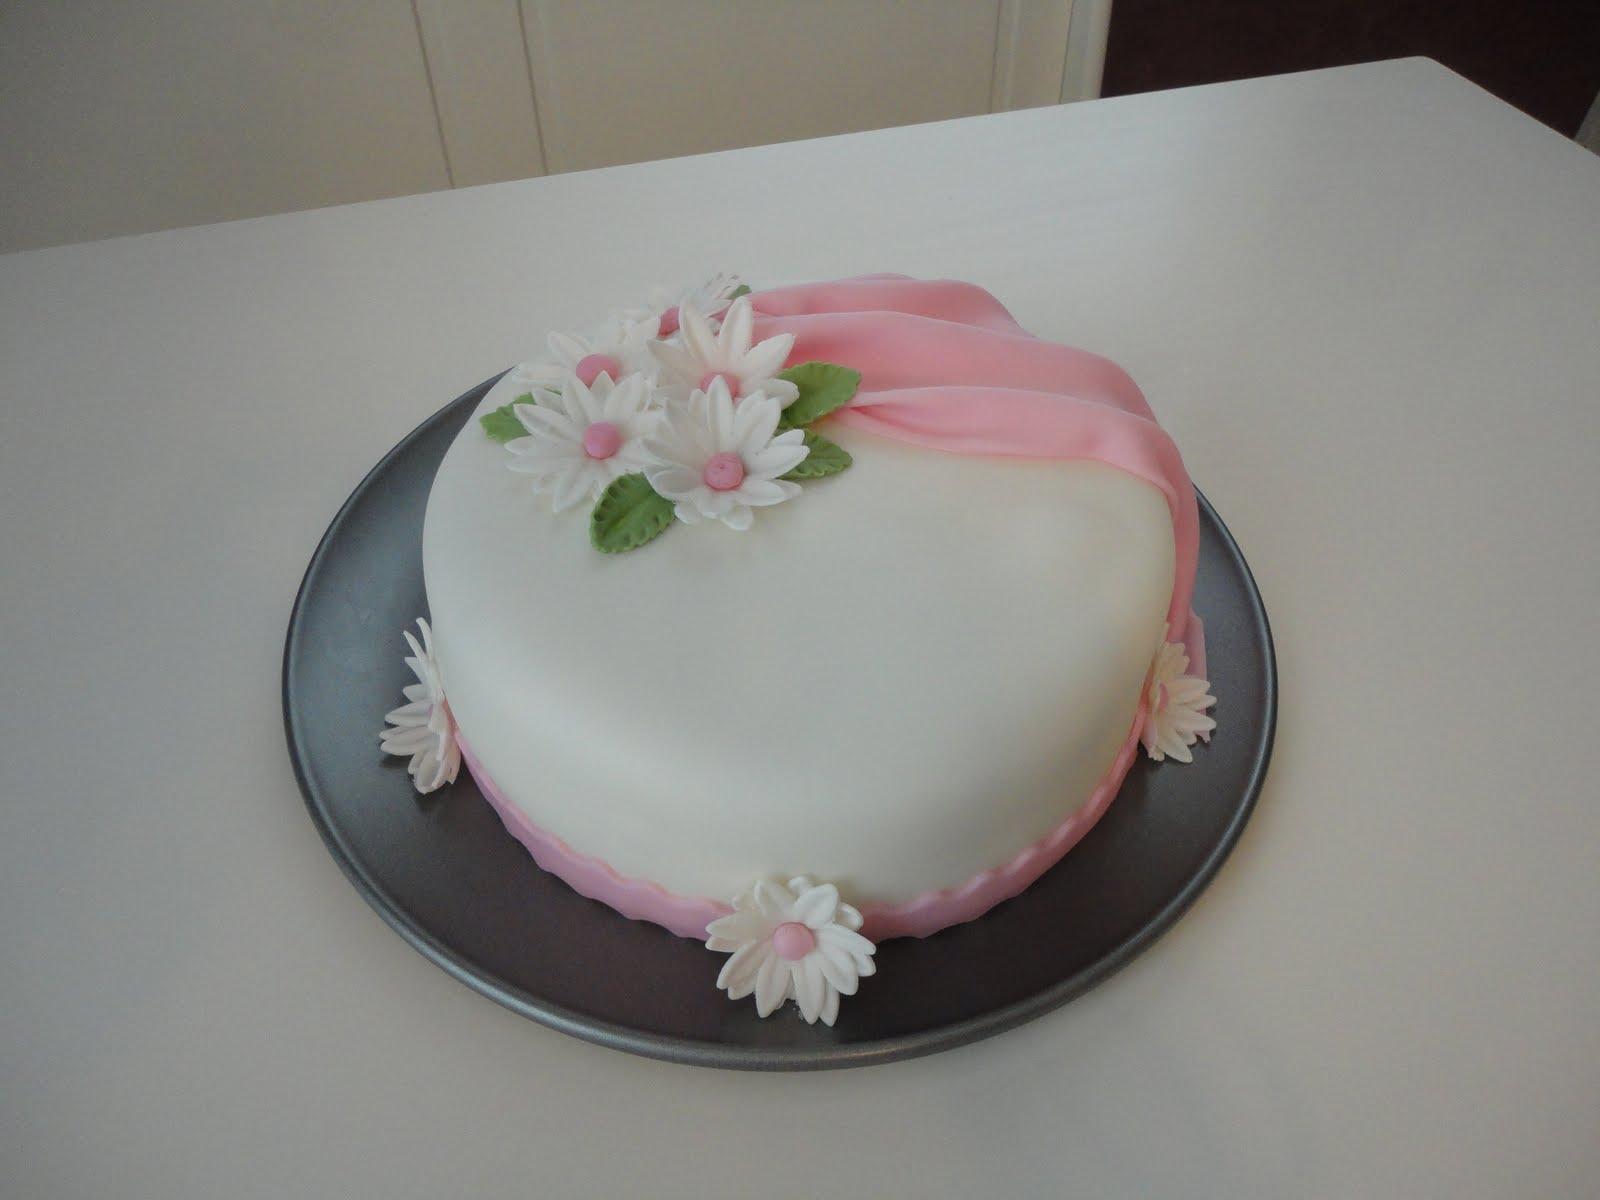 Wilton Cake Fondant Class : SKRINKLEZ: Wilton Course 3 Fondant/Gumpaste Final Cake